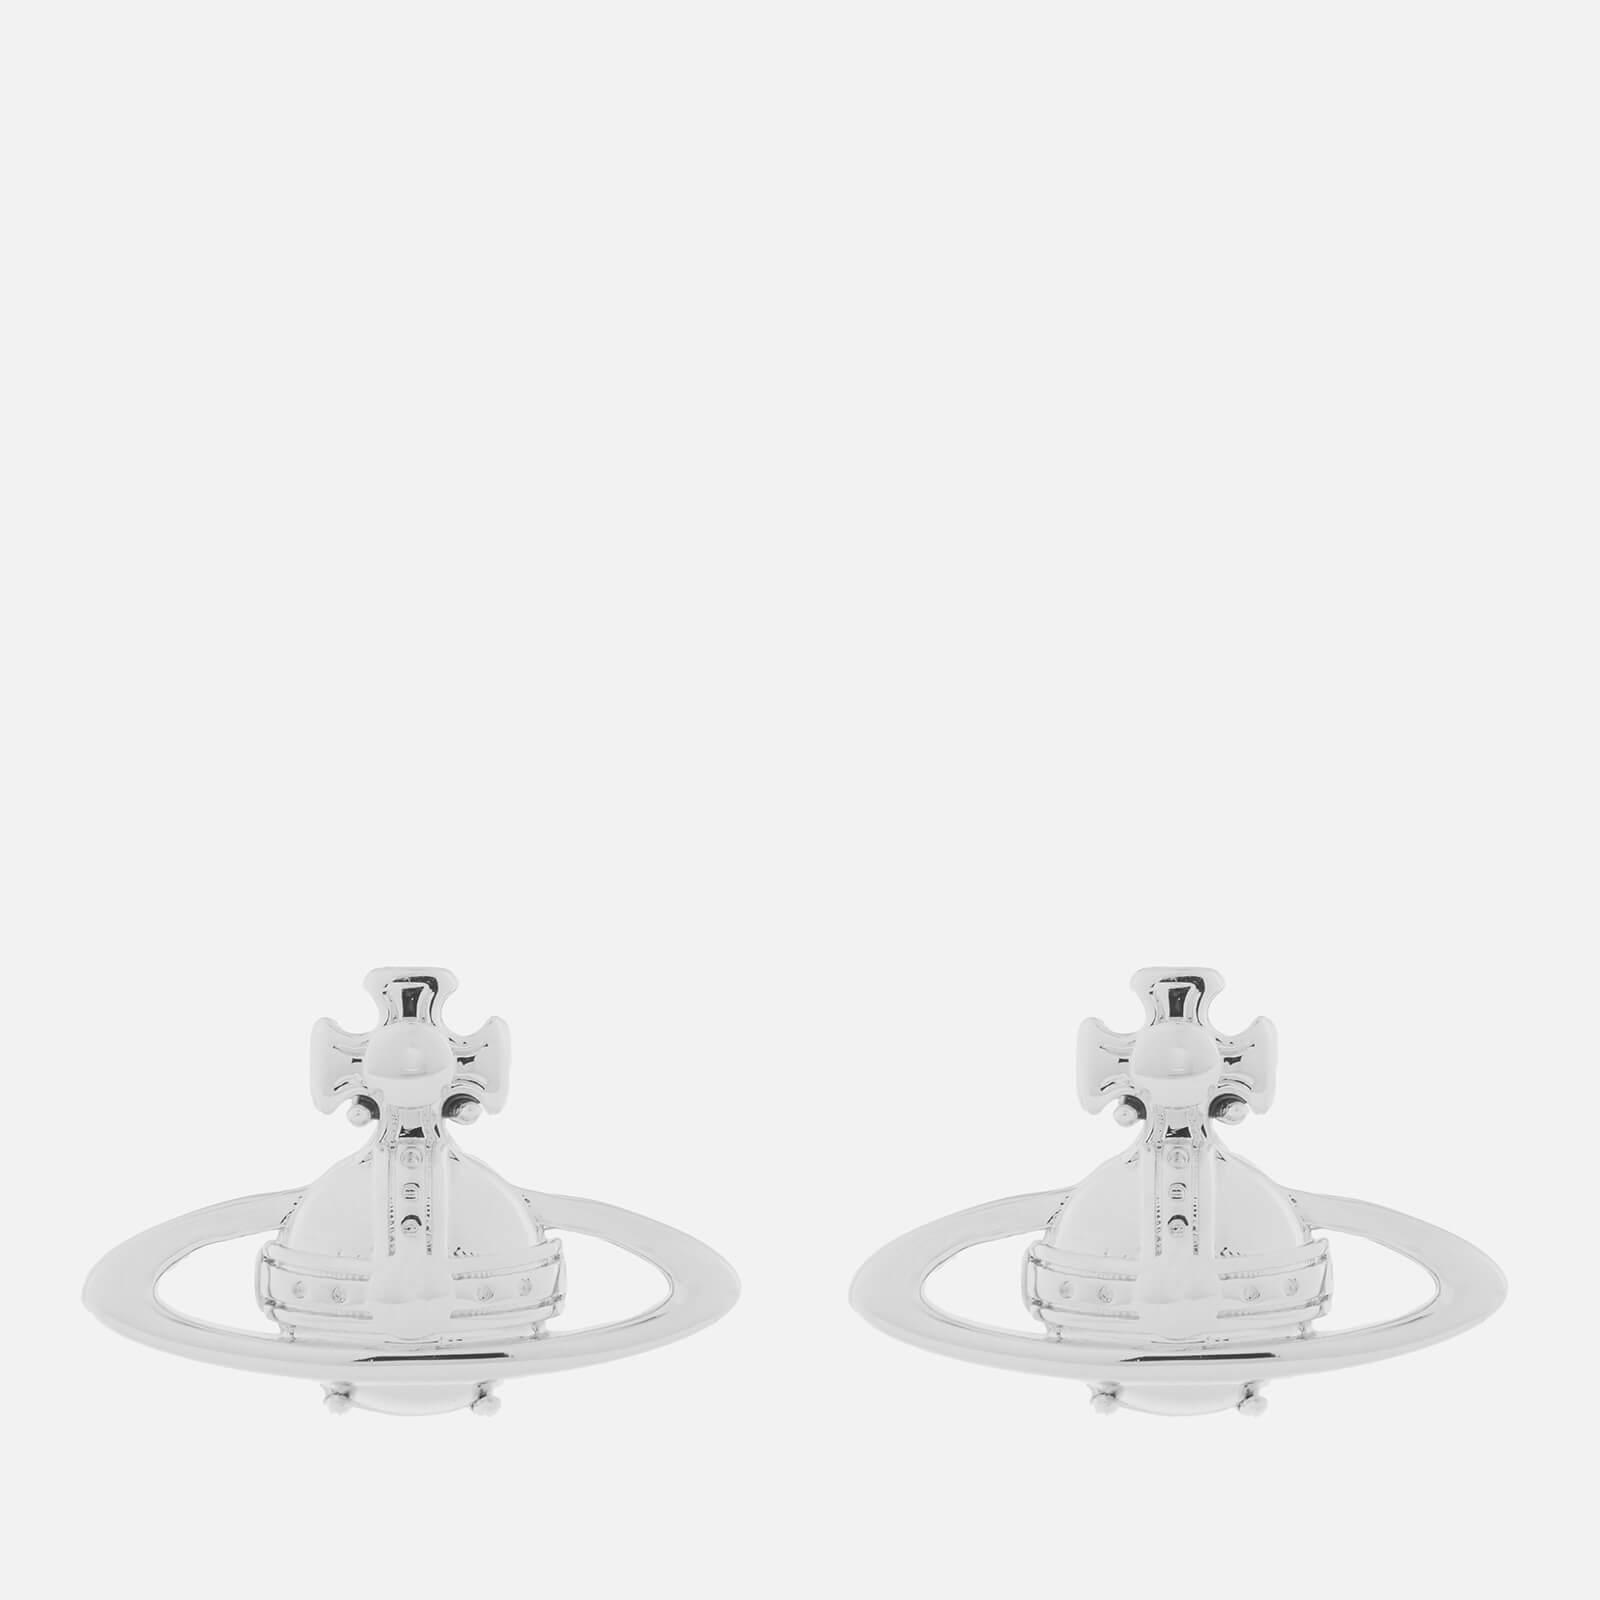 Vivienne Westwood Women's Suzie Earrings - Rhodium